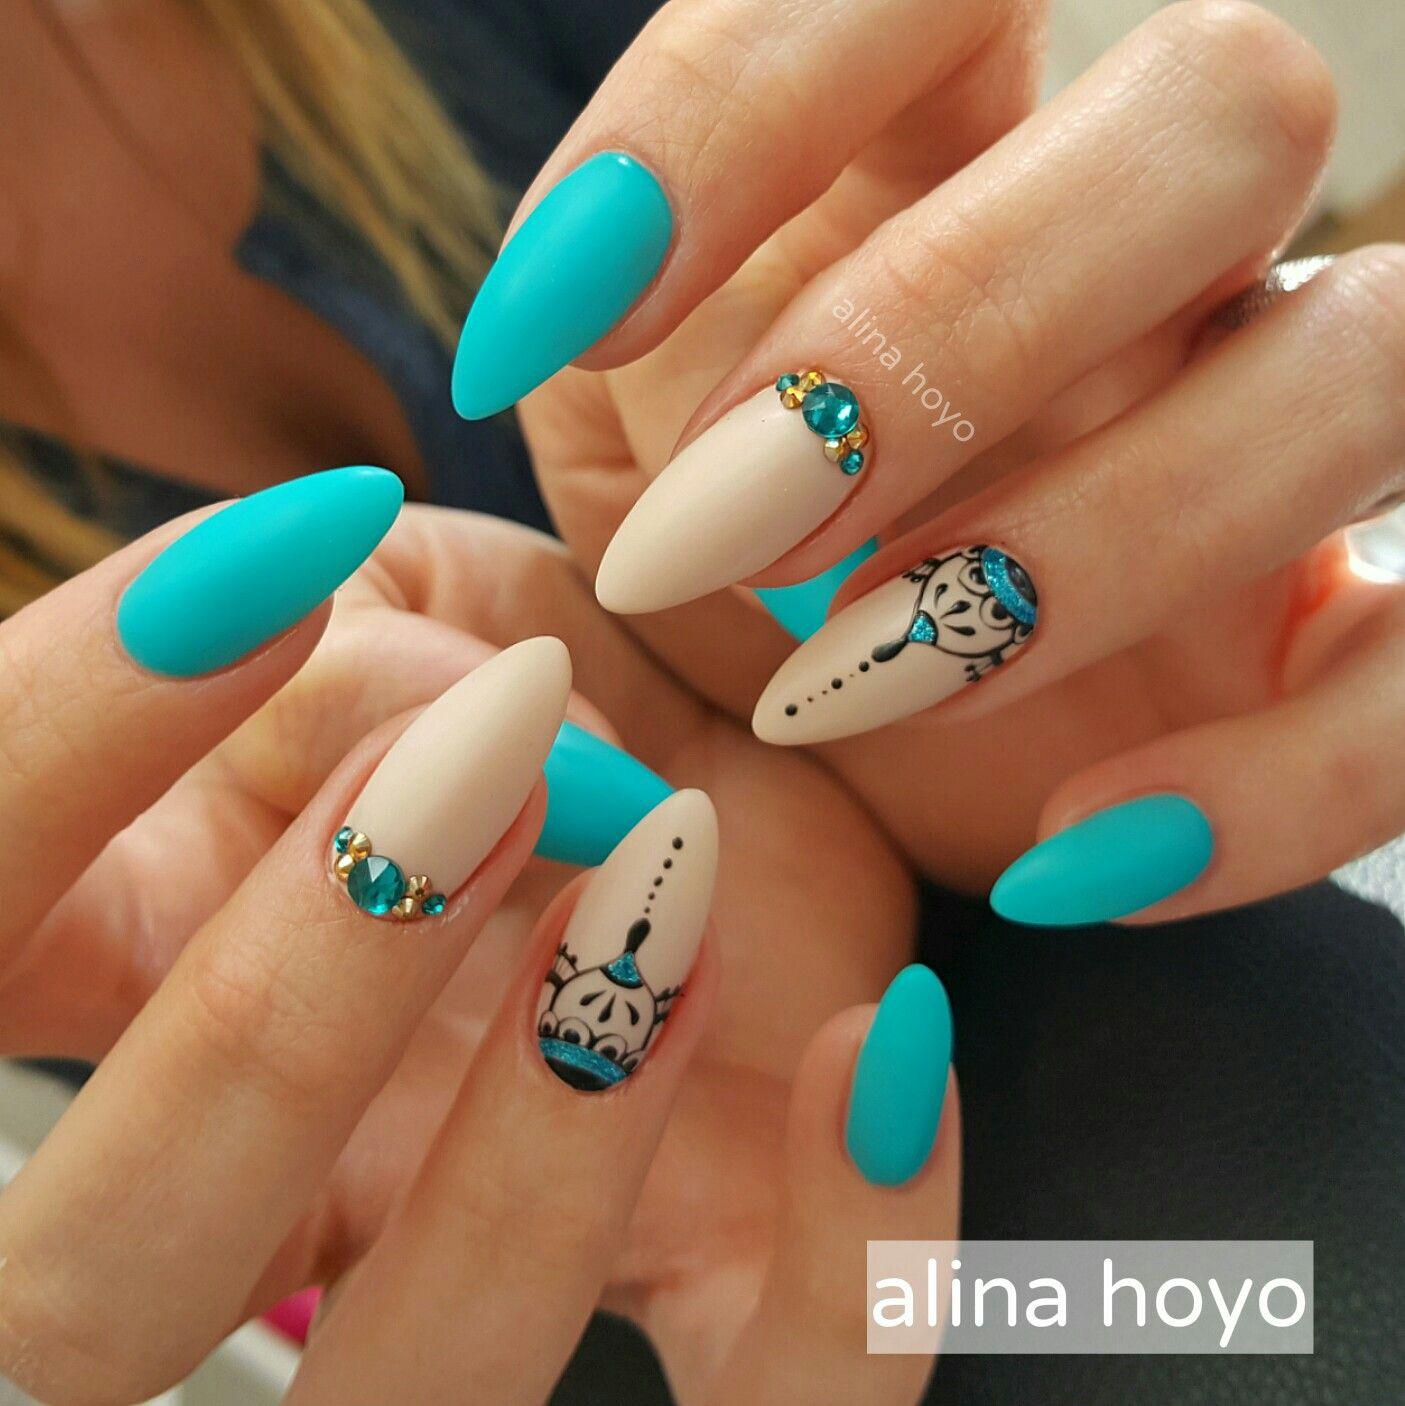 Pin by Lizette Jacobs on NAIL ART | Pinterest | Fall nail colors ...